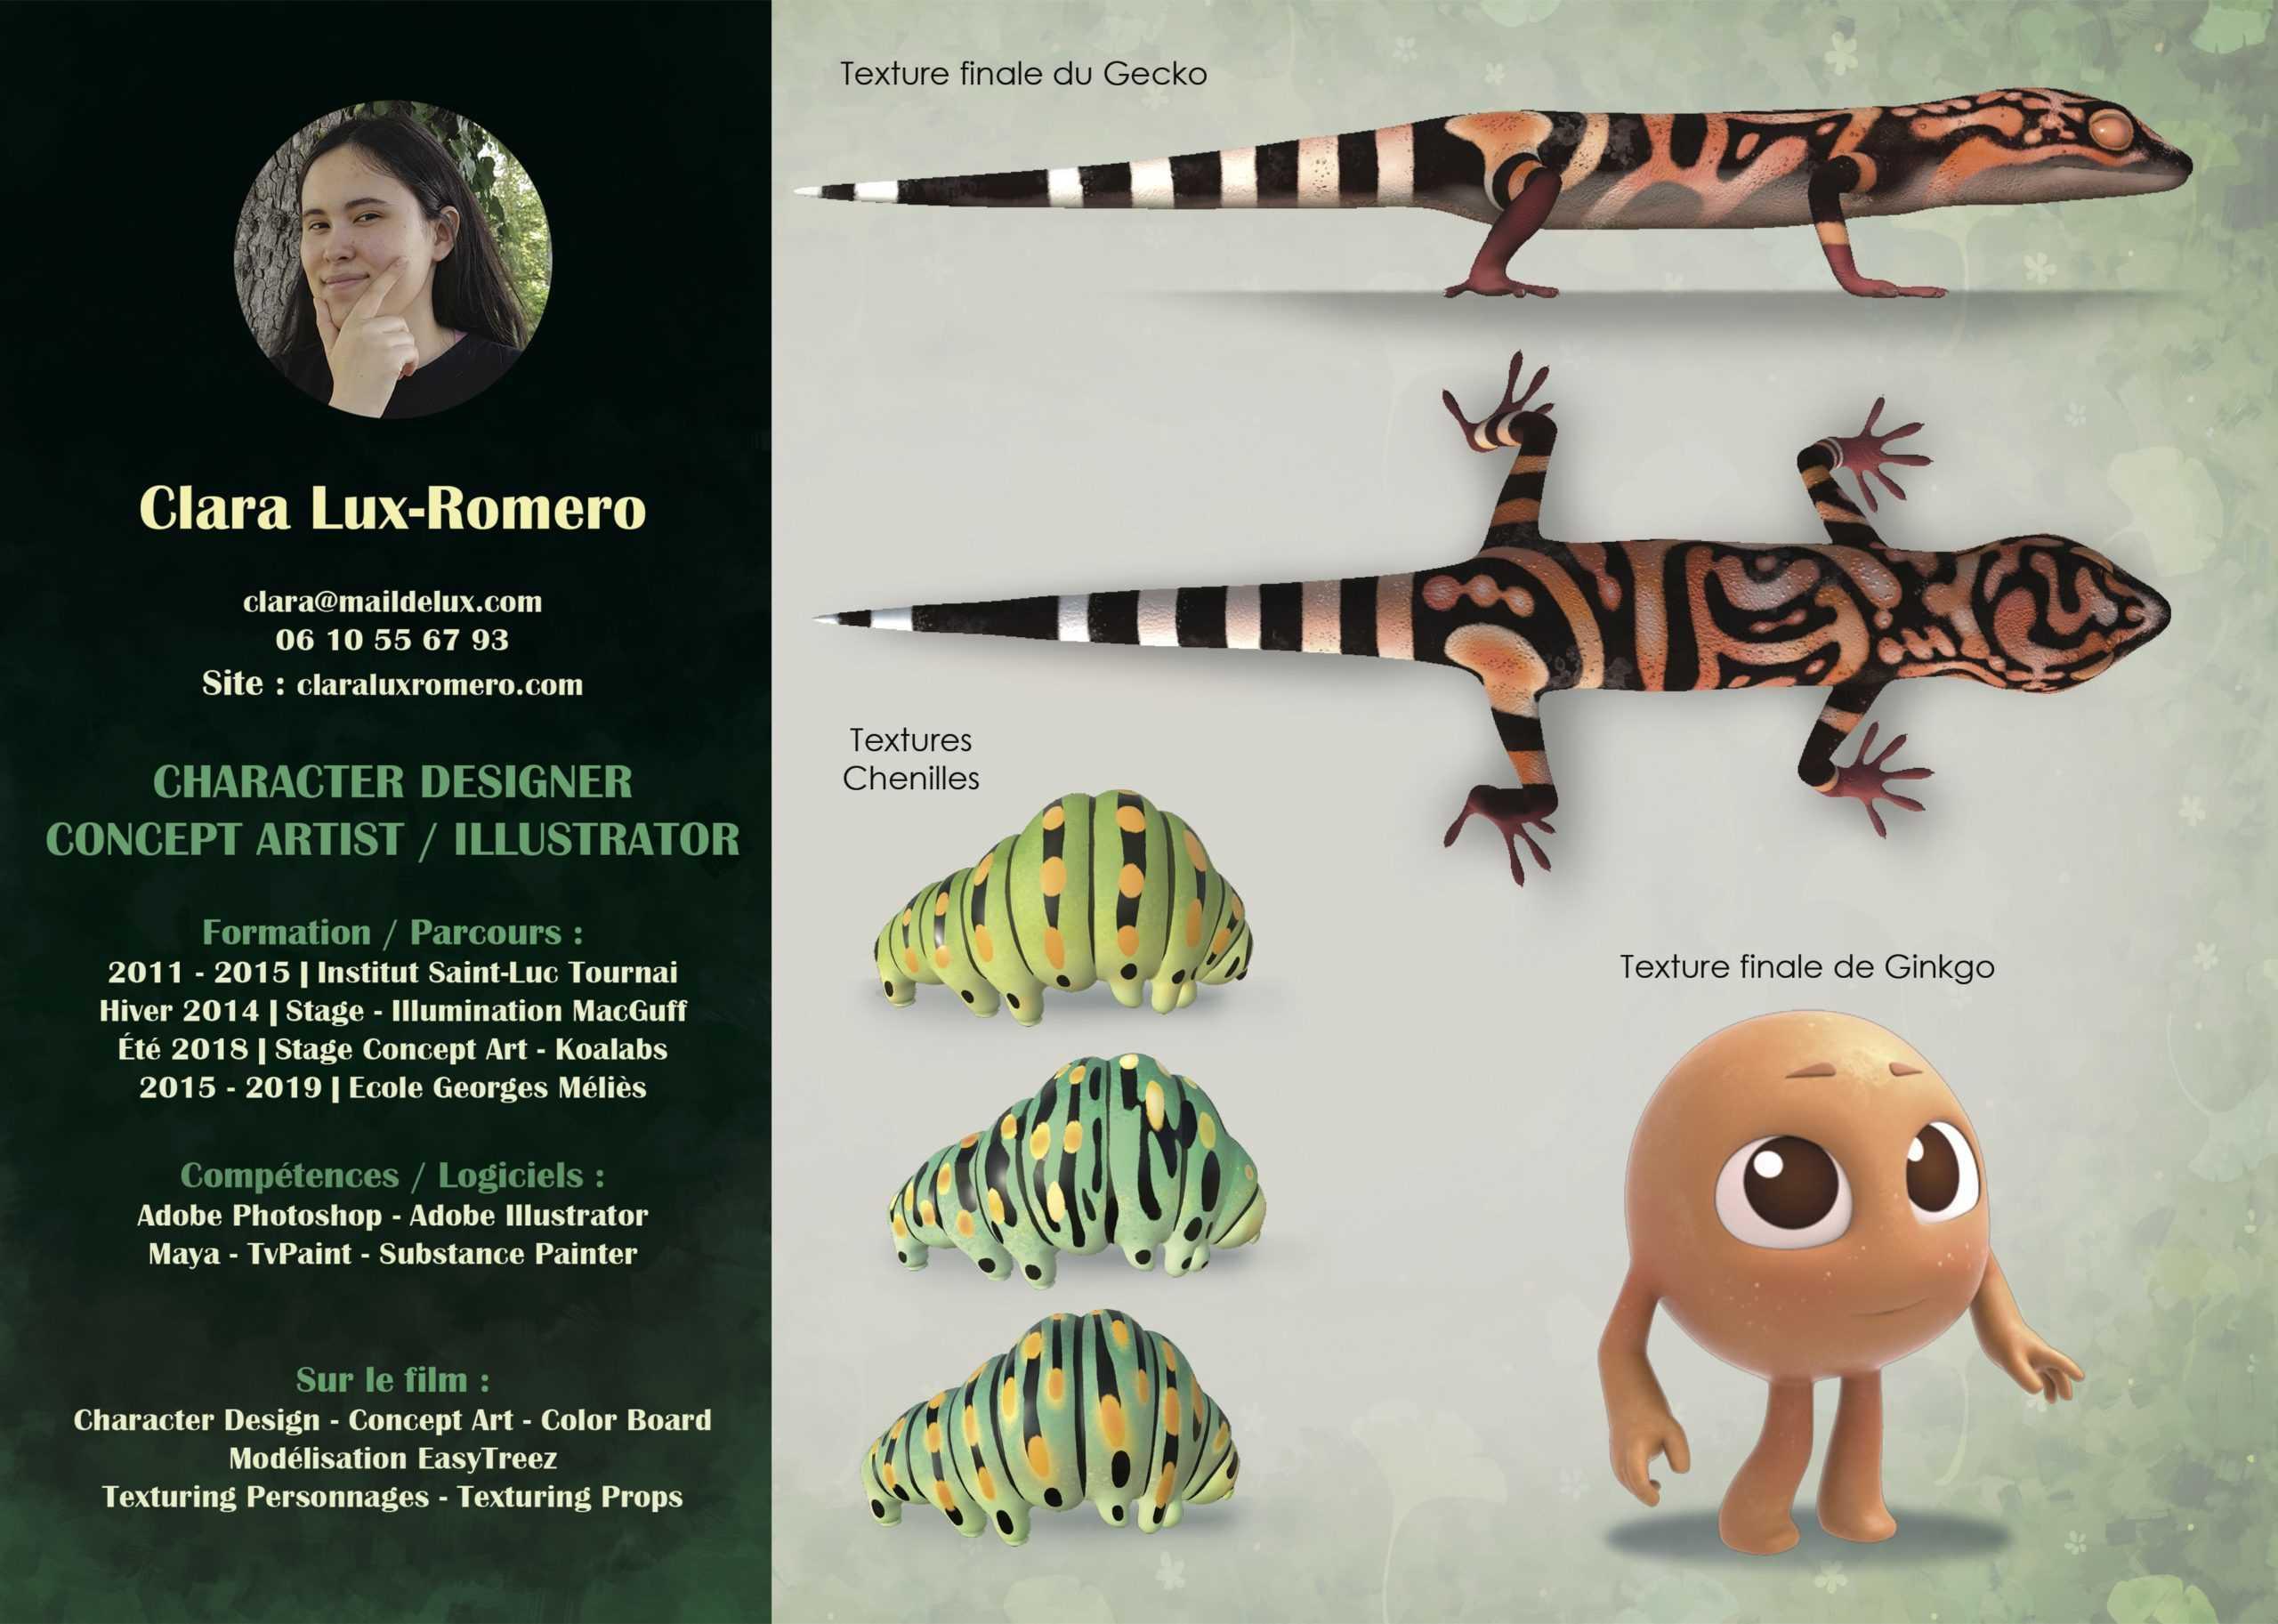 ginkgo-clara-lux-romero-1-scaled.jpg